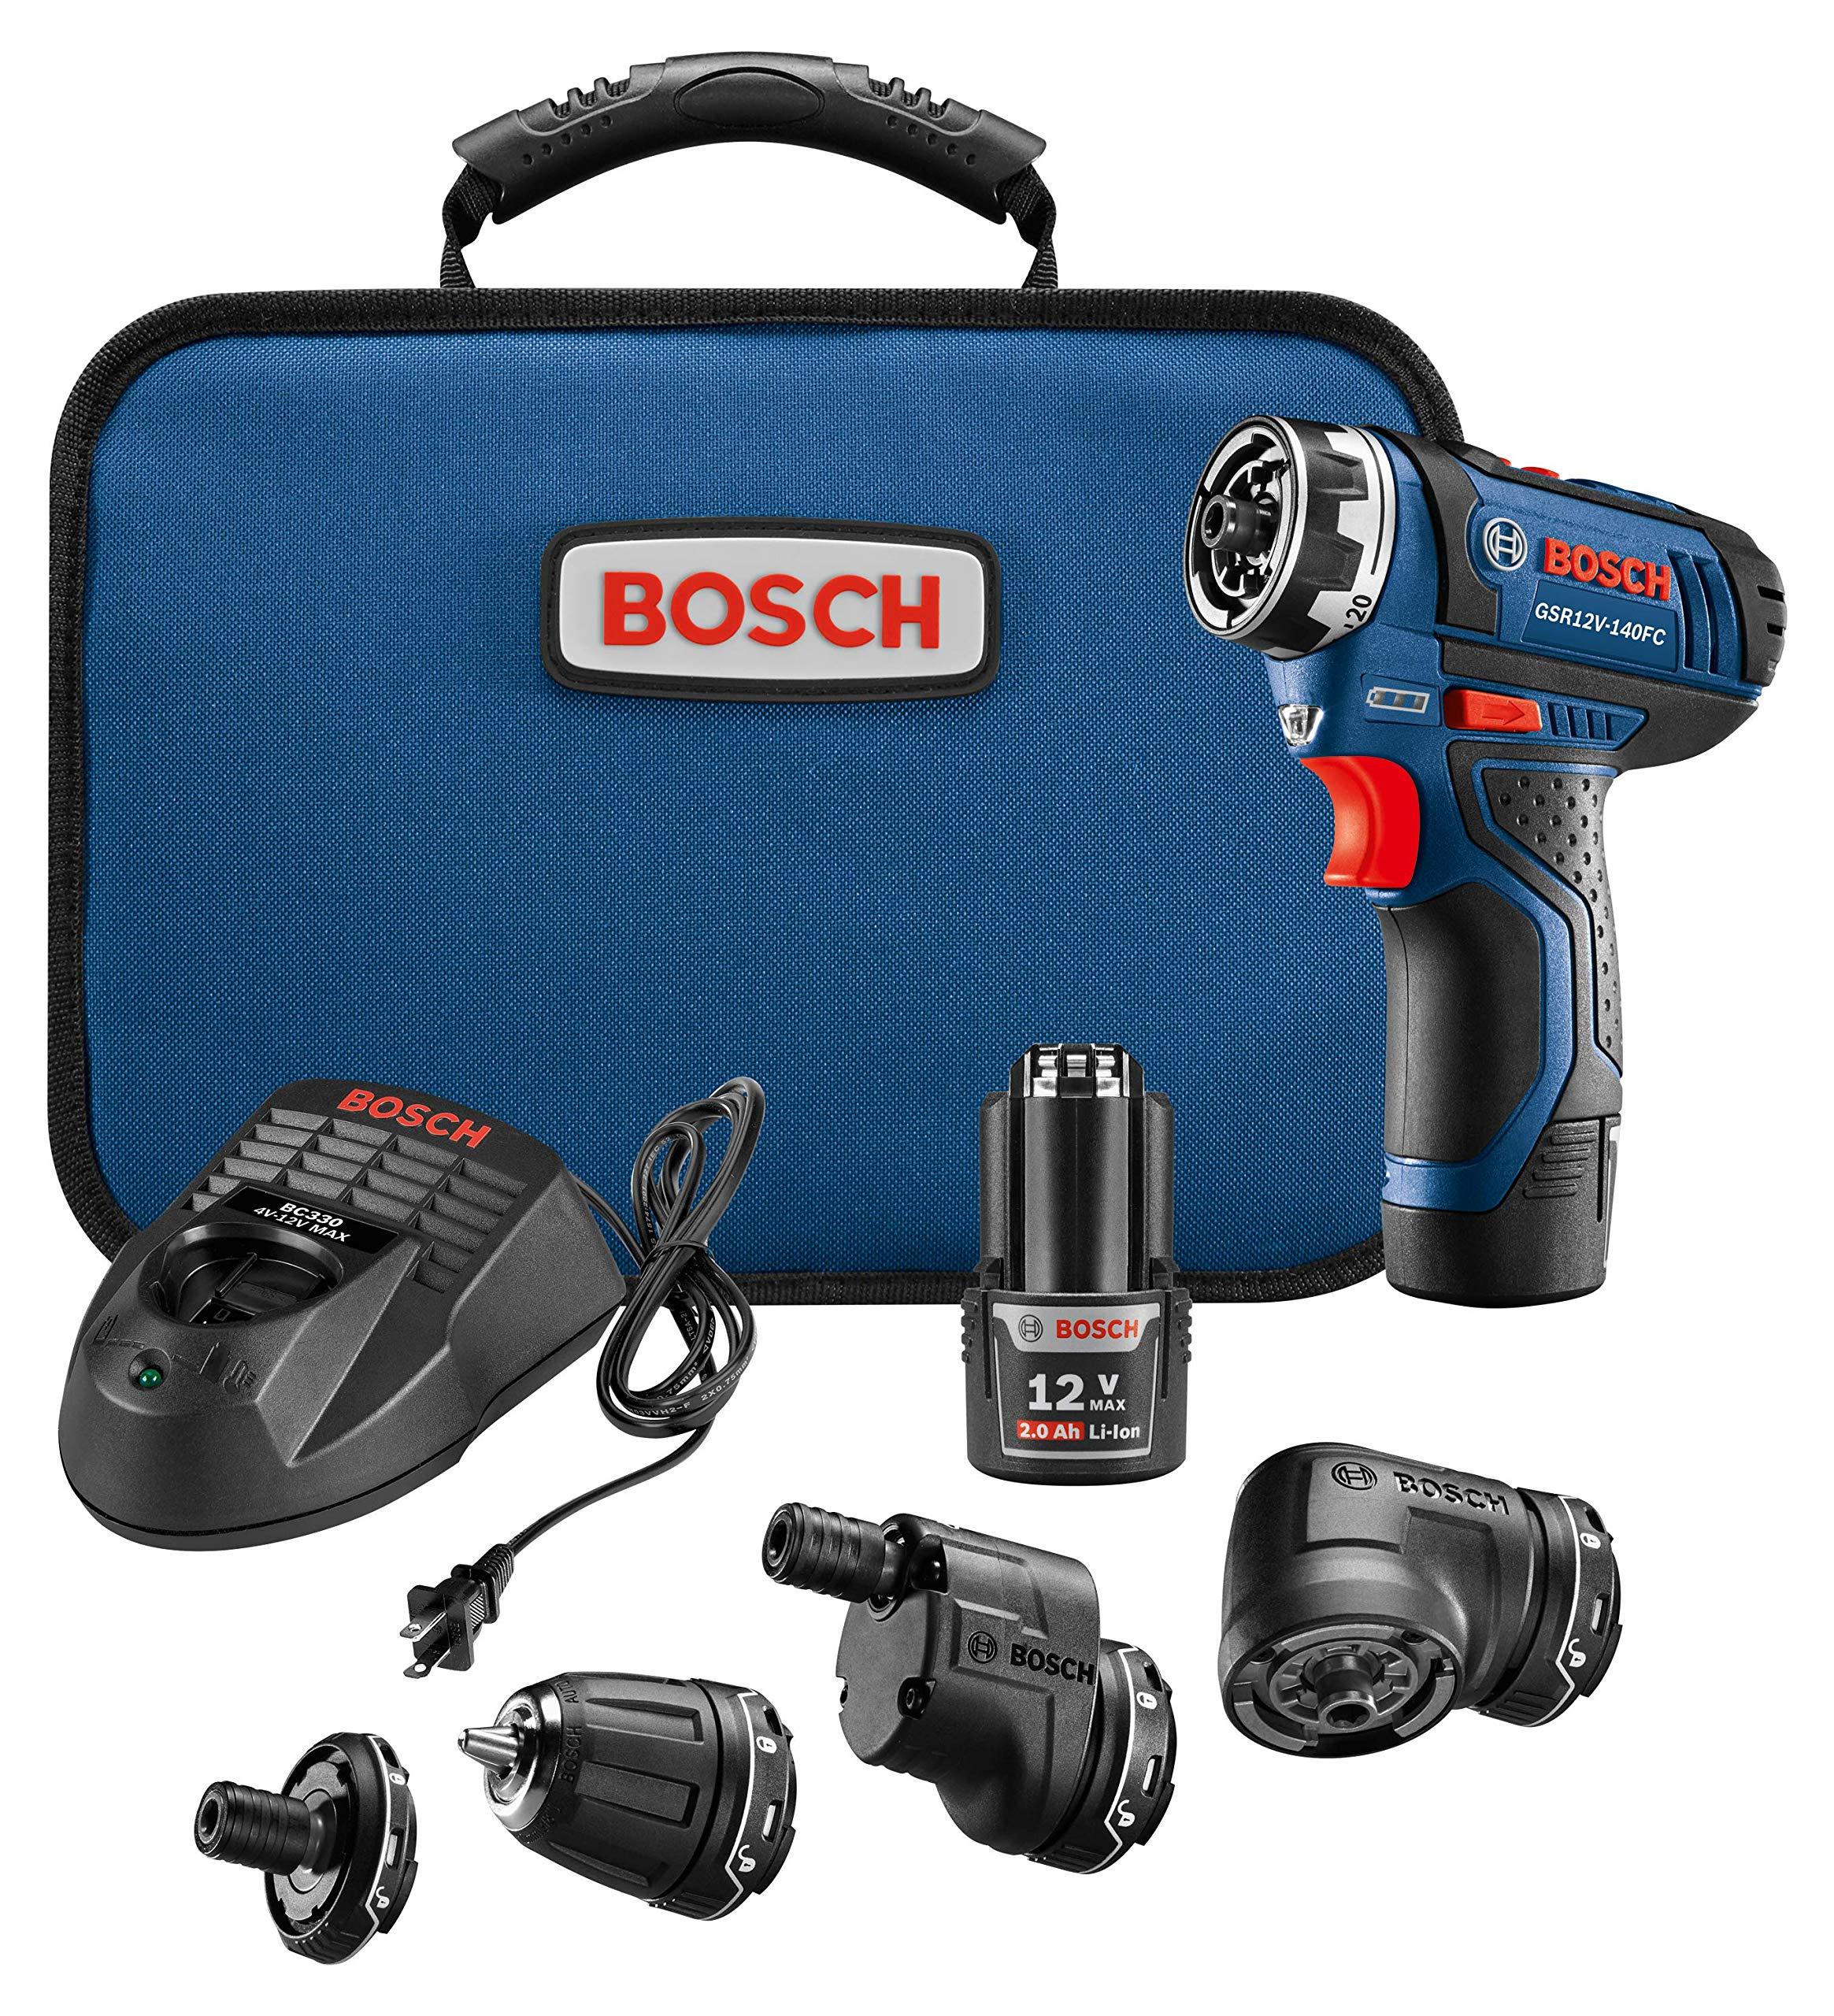 Bosch GSR12V-140FCB22 Cordless Electric Screwdriver 12V Kit - 5-In-1 Multi-Head Power Drill Set